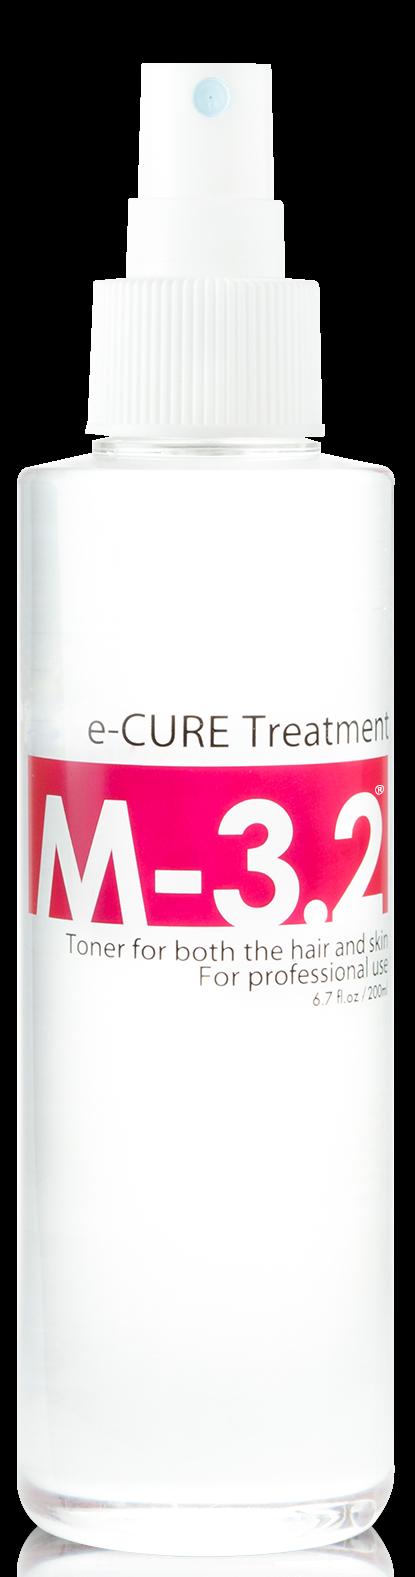 M 3.2